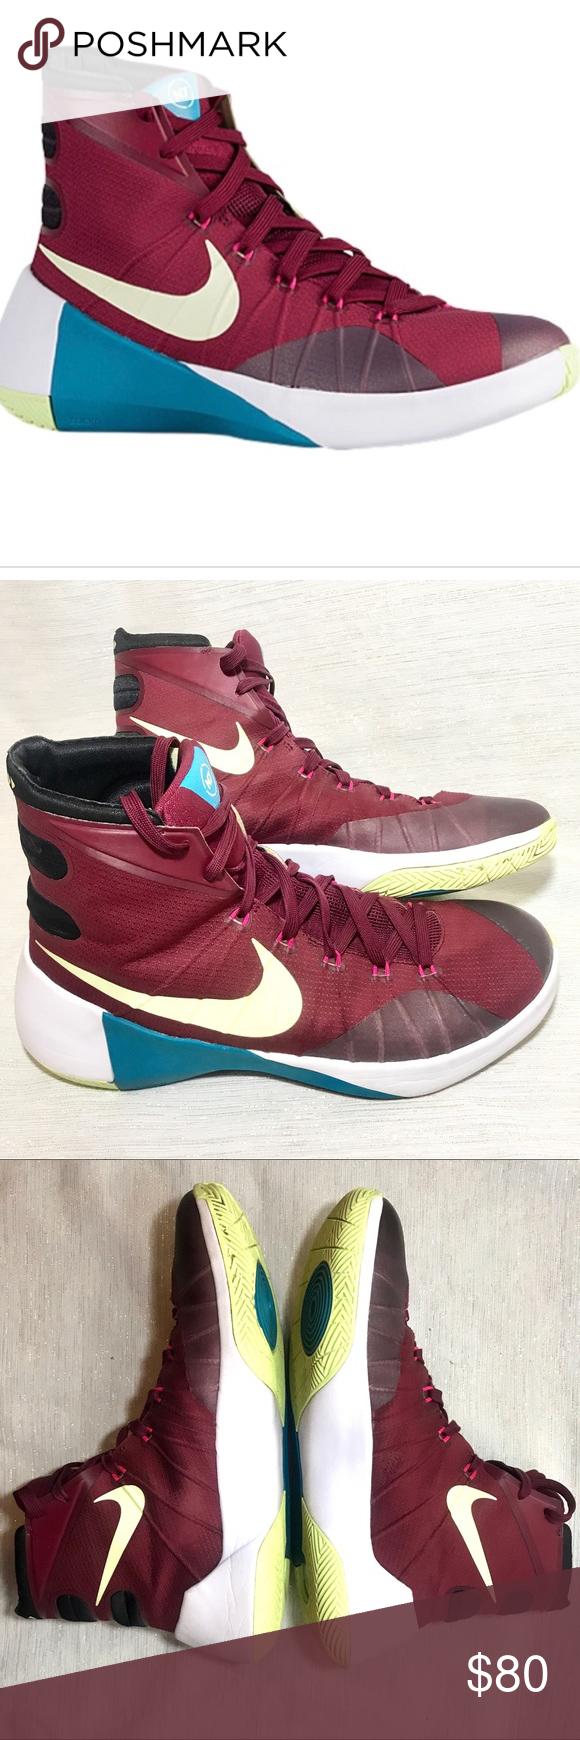 3b3dbf09509a ✓️Nike Hyperdunk 2015 N7 ✓ Nike Hyperdunk 2015 N7 men s basketball shoes.  Colors